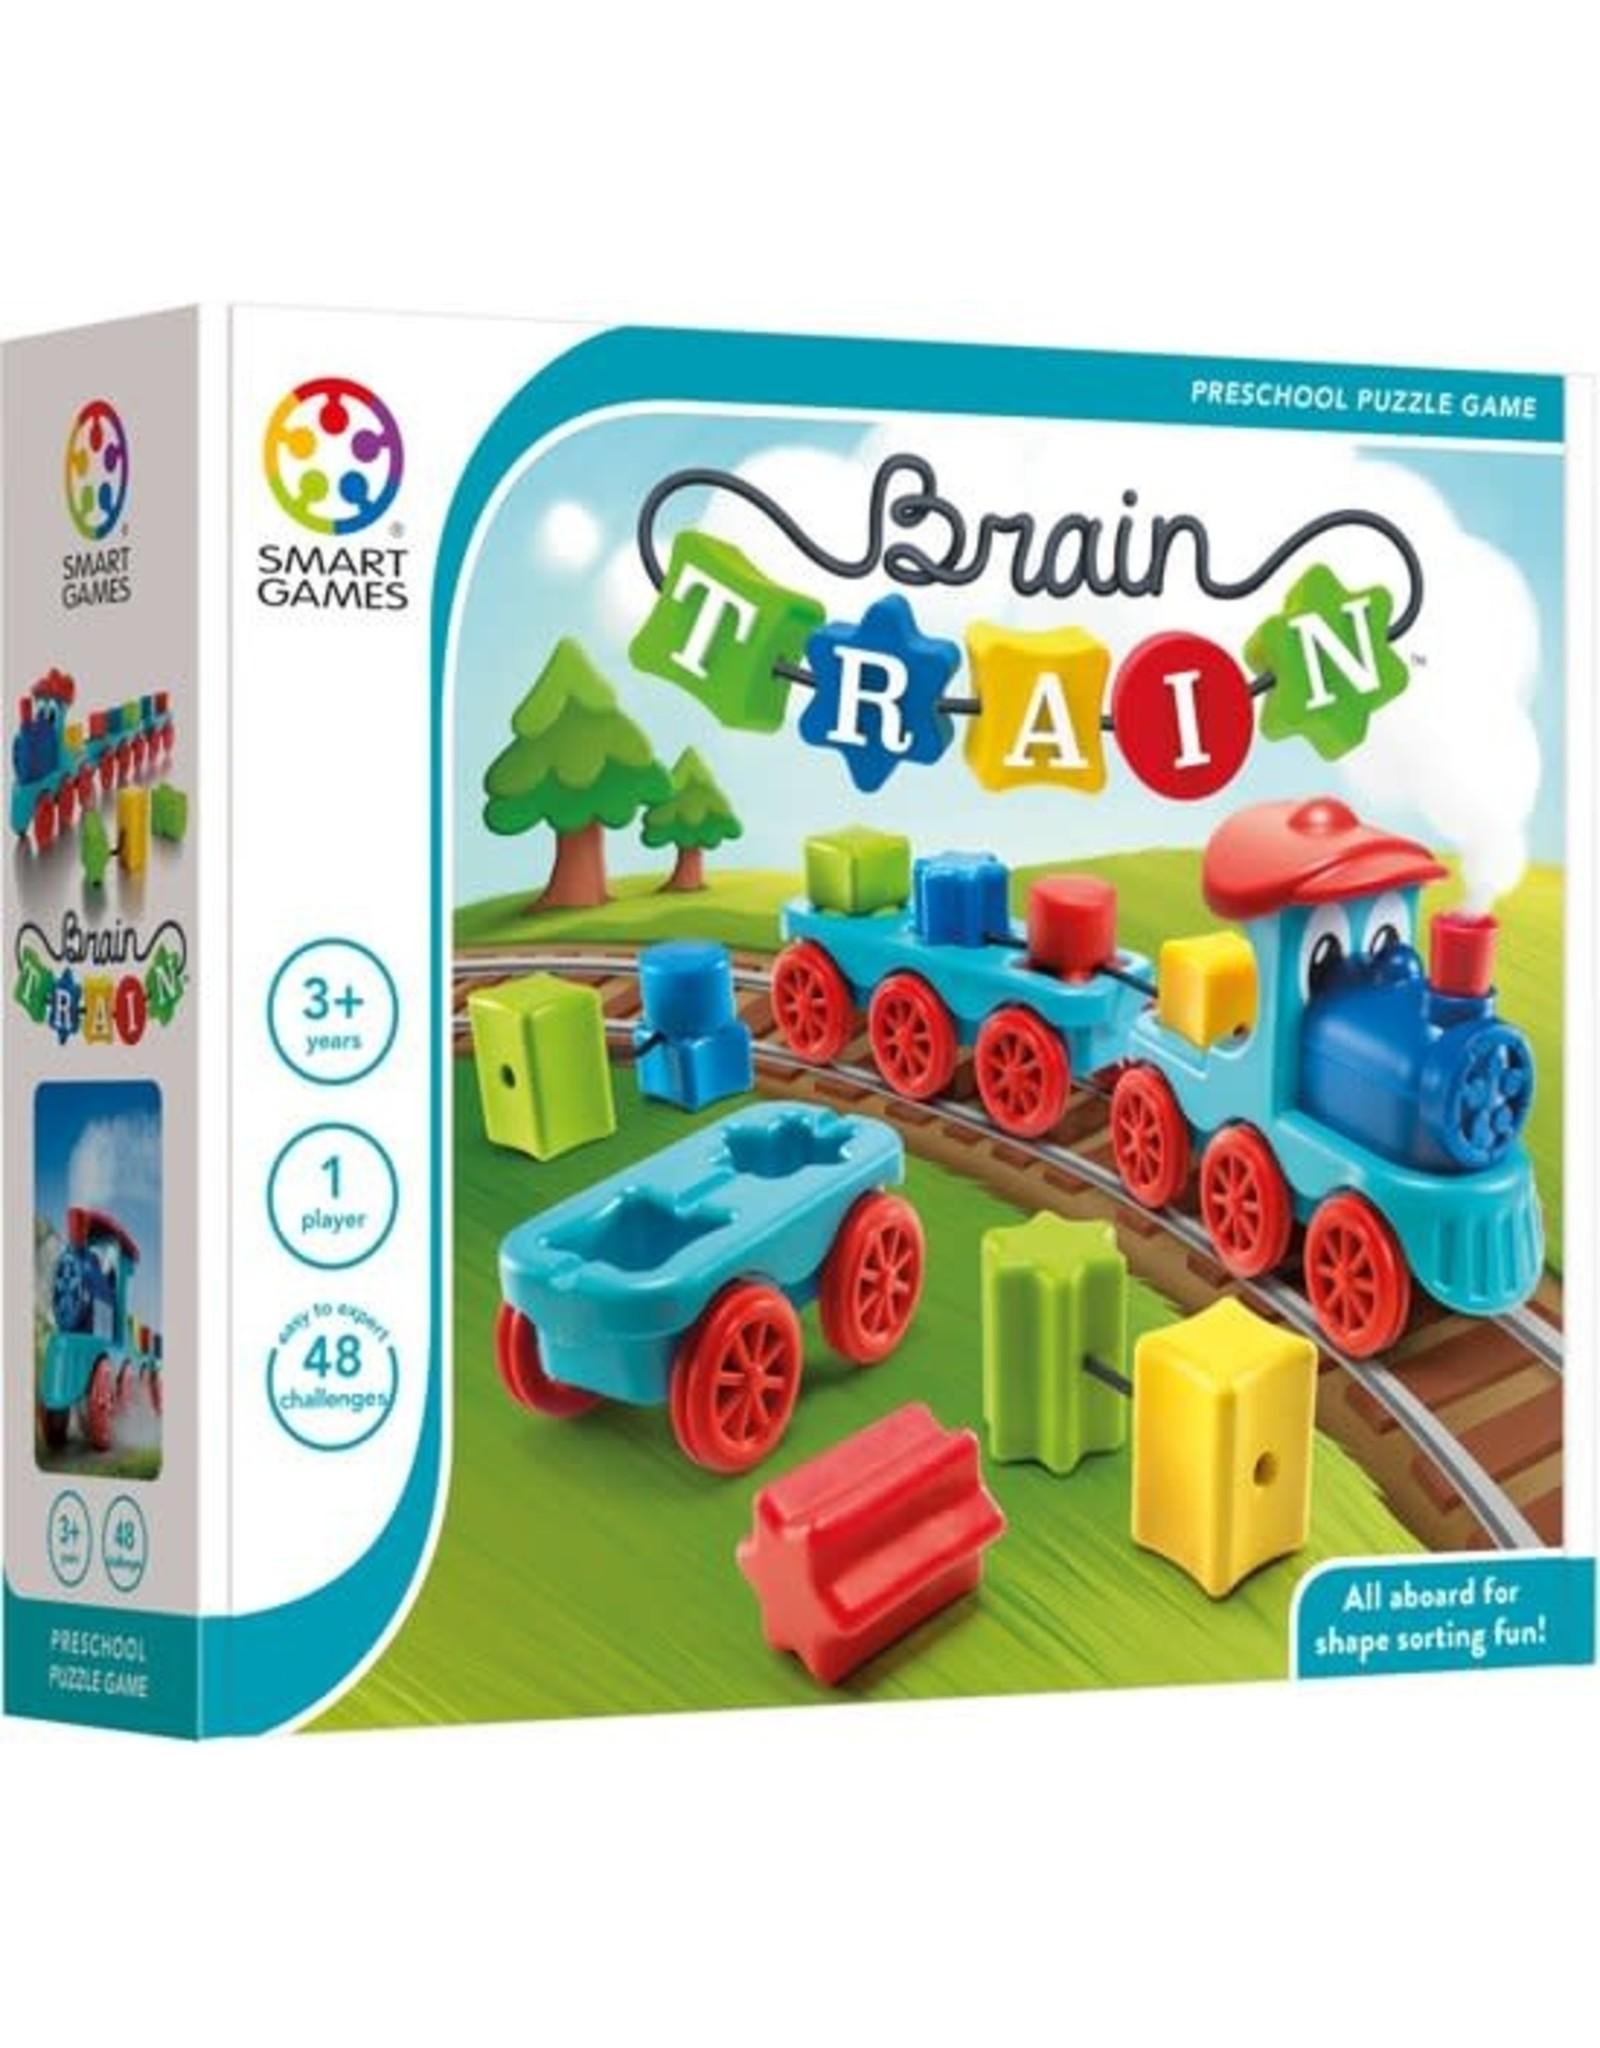 Smart Smart Games Preschool - Brain Train